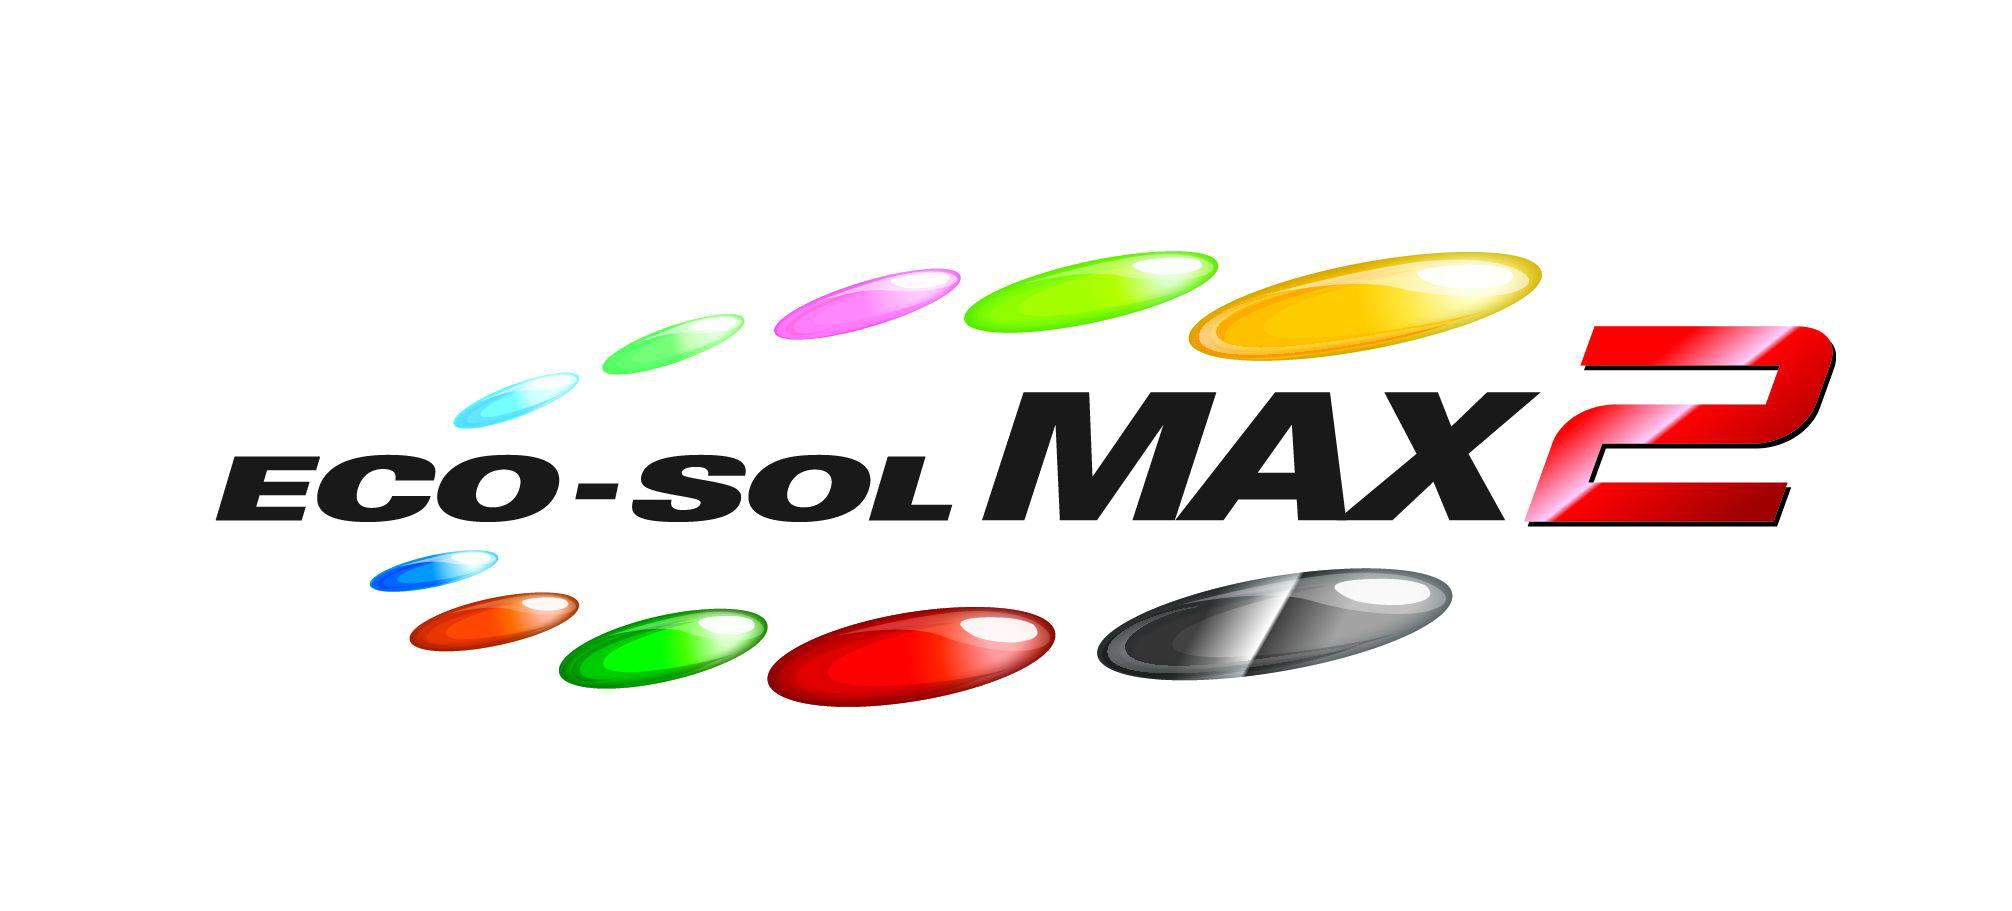 Logo ecosolmax2